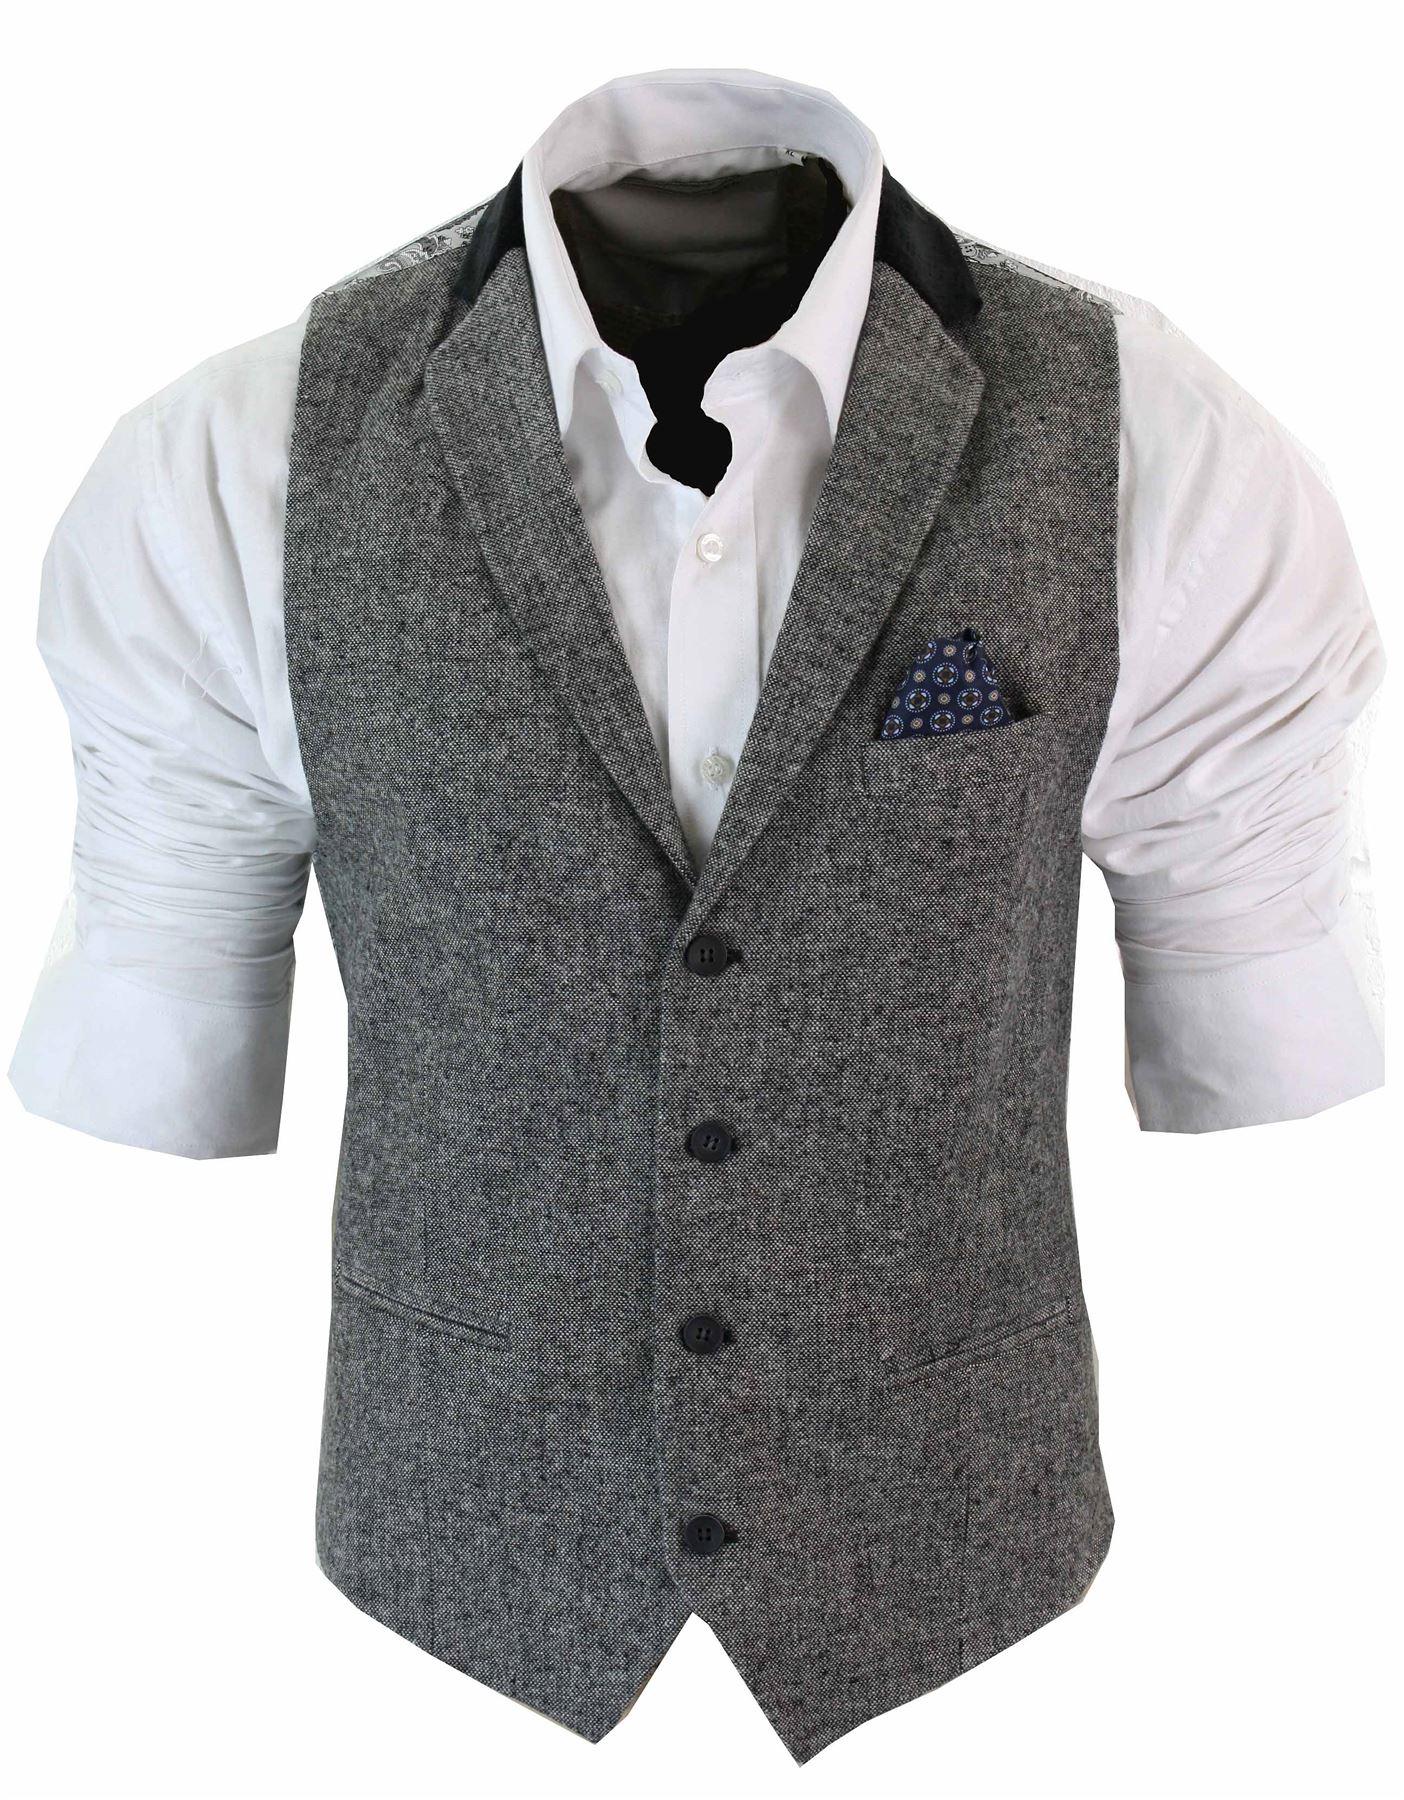 gilet homme veston vintage tweed chevrons marron noir. Black Bedroom Furniture Sets. Home Design Ideas